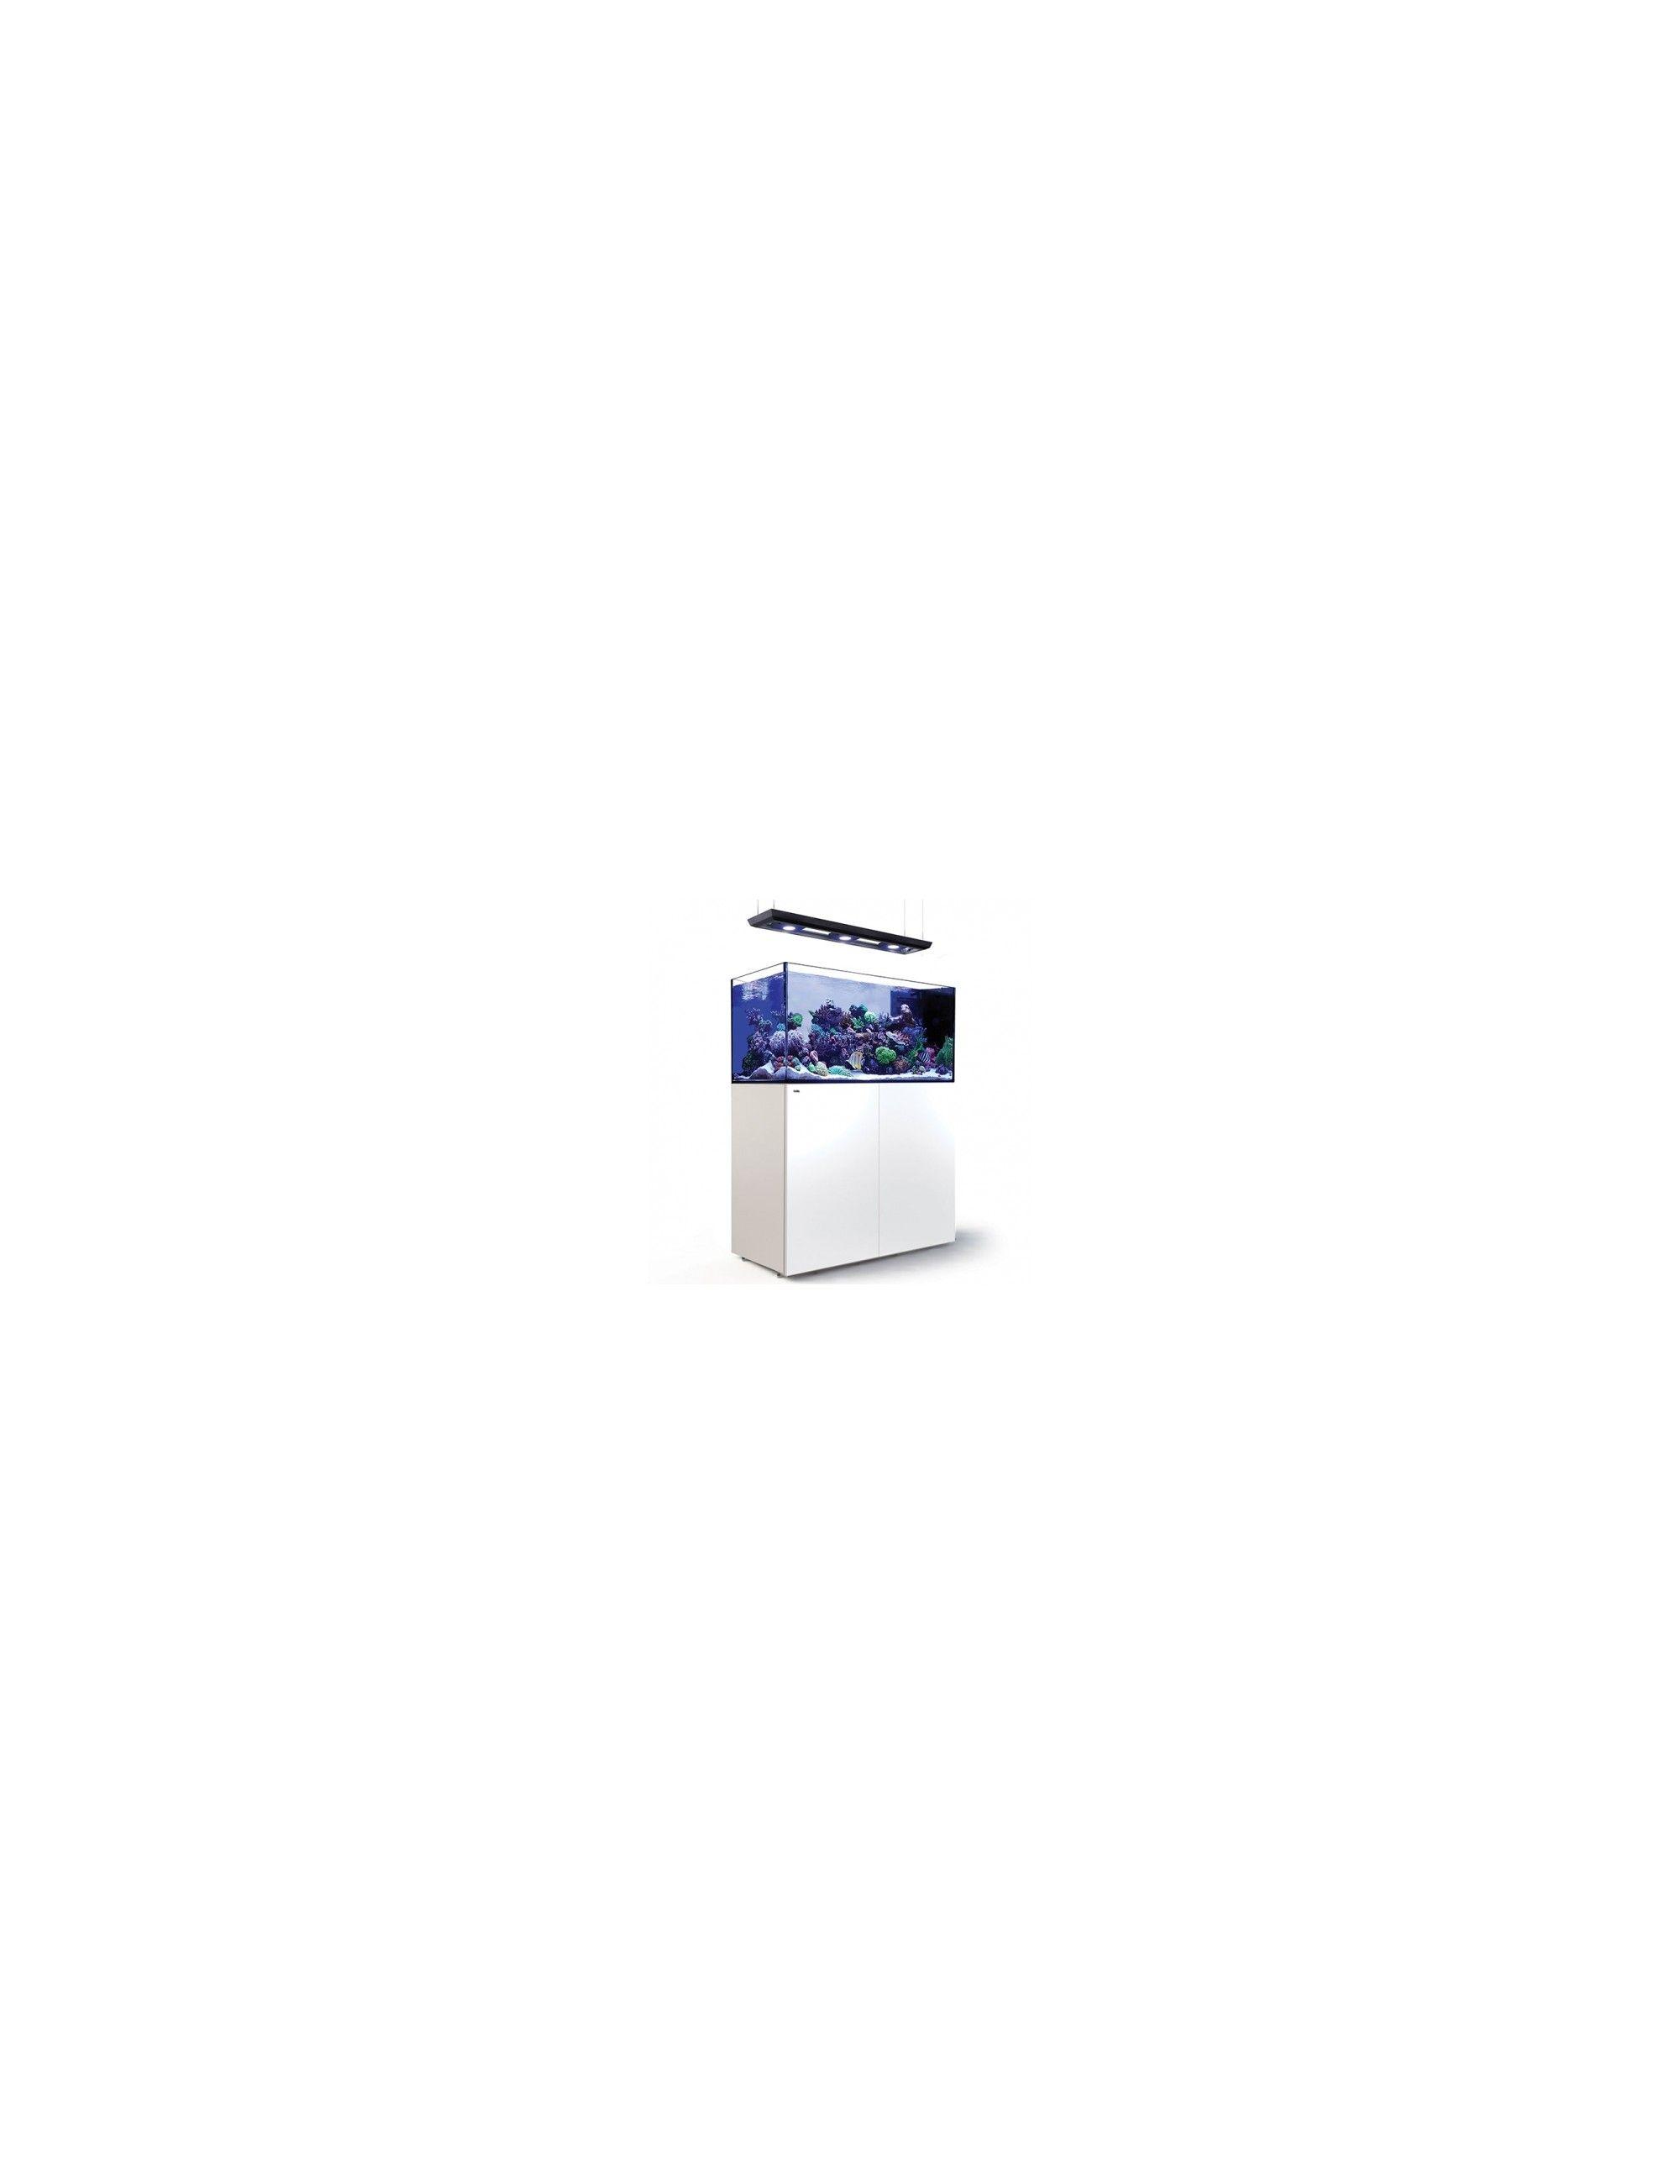 RED SEA - Reefer Peninsula Deluxe - P500 - Blanc - (3 ReefLED , rampe suspendue)